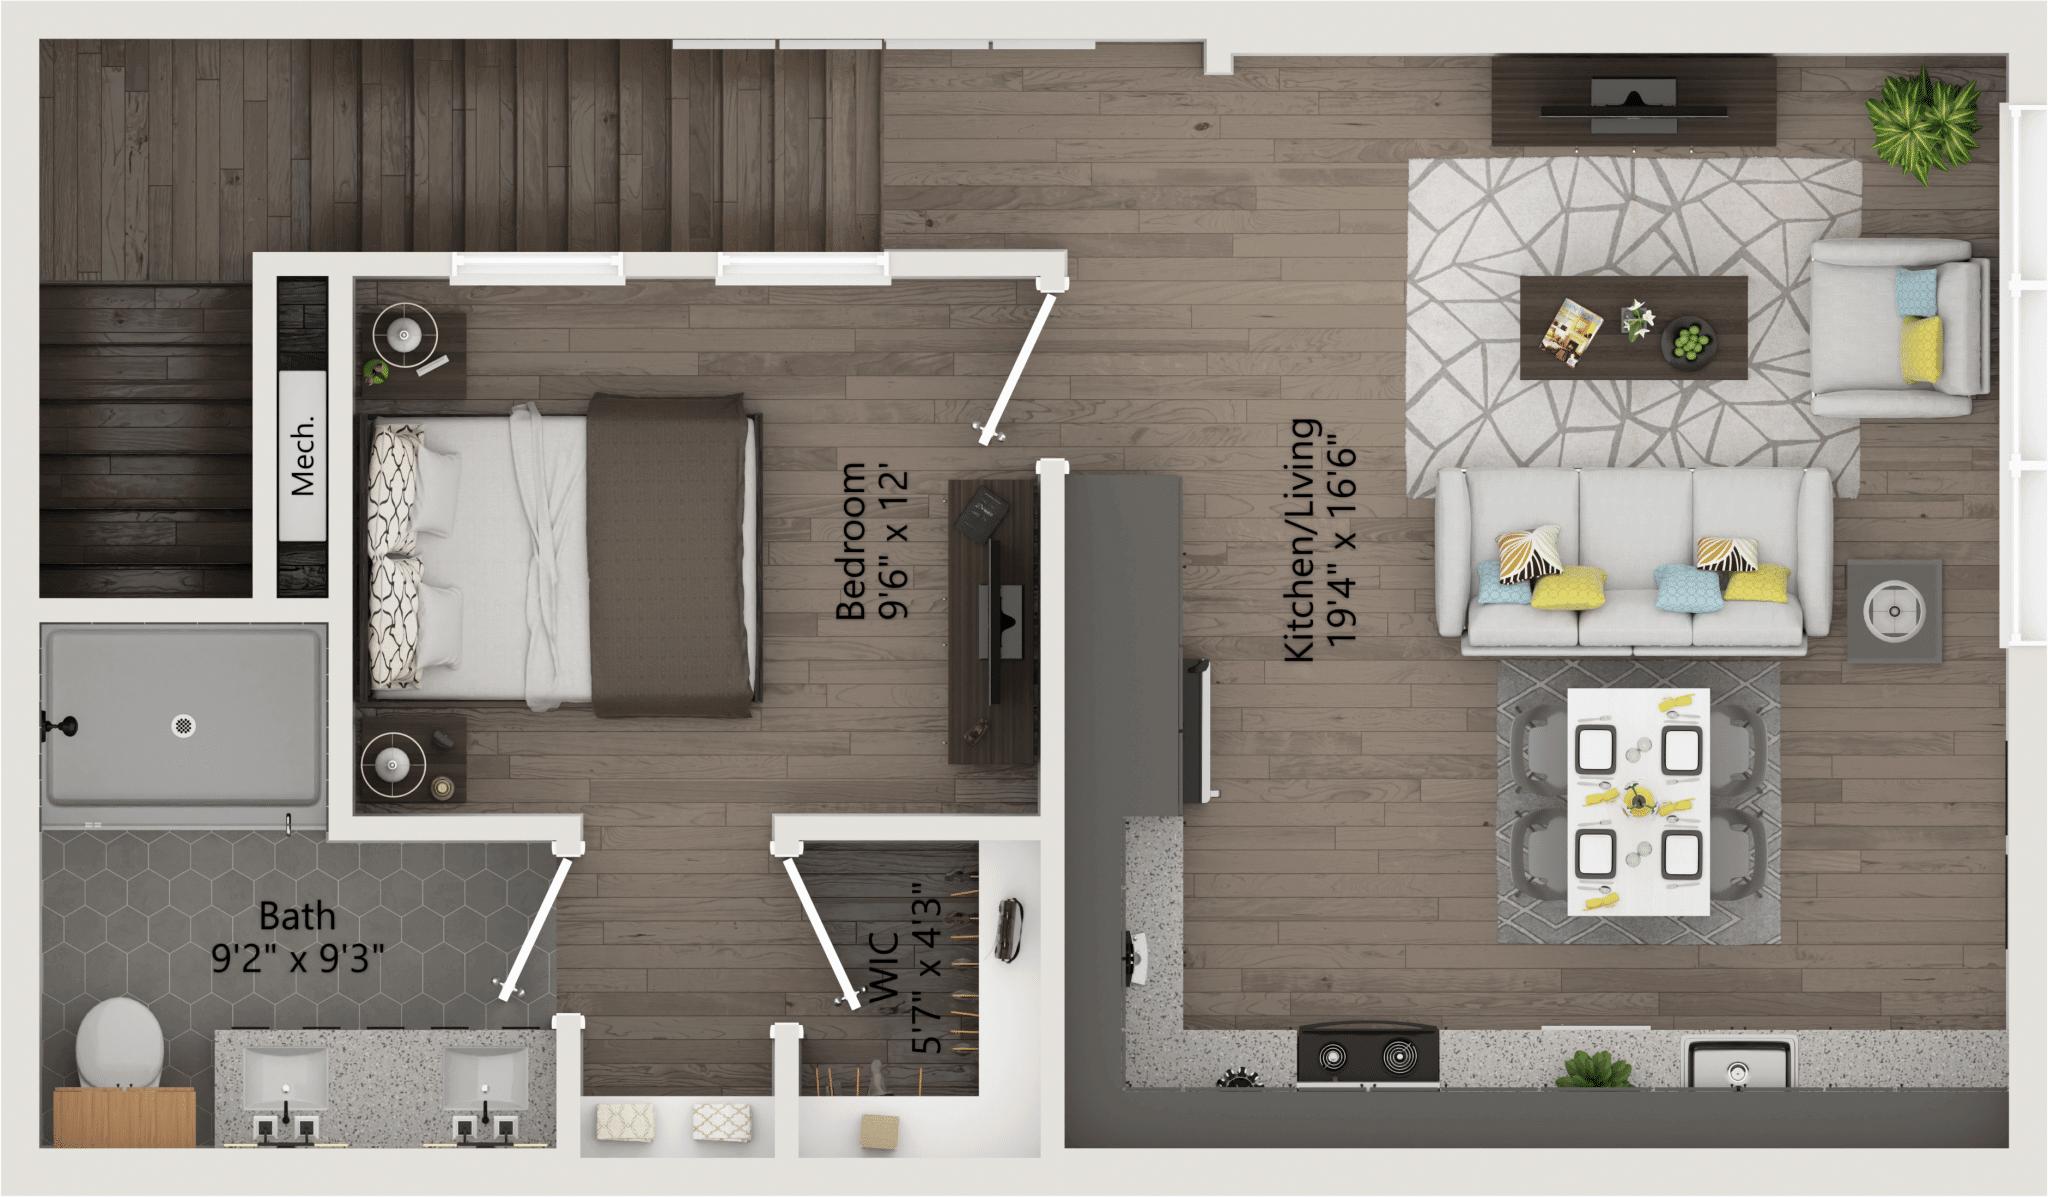 three Bedroom 1,940ft,717ft,patio